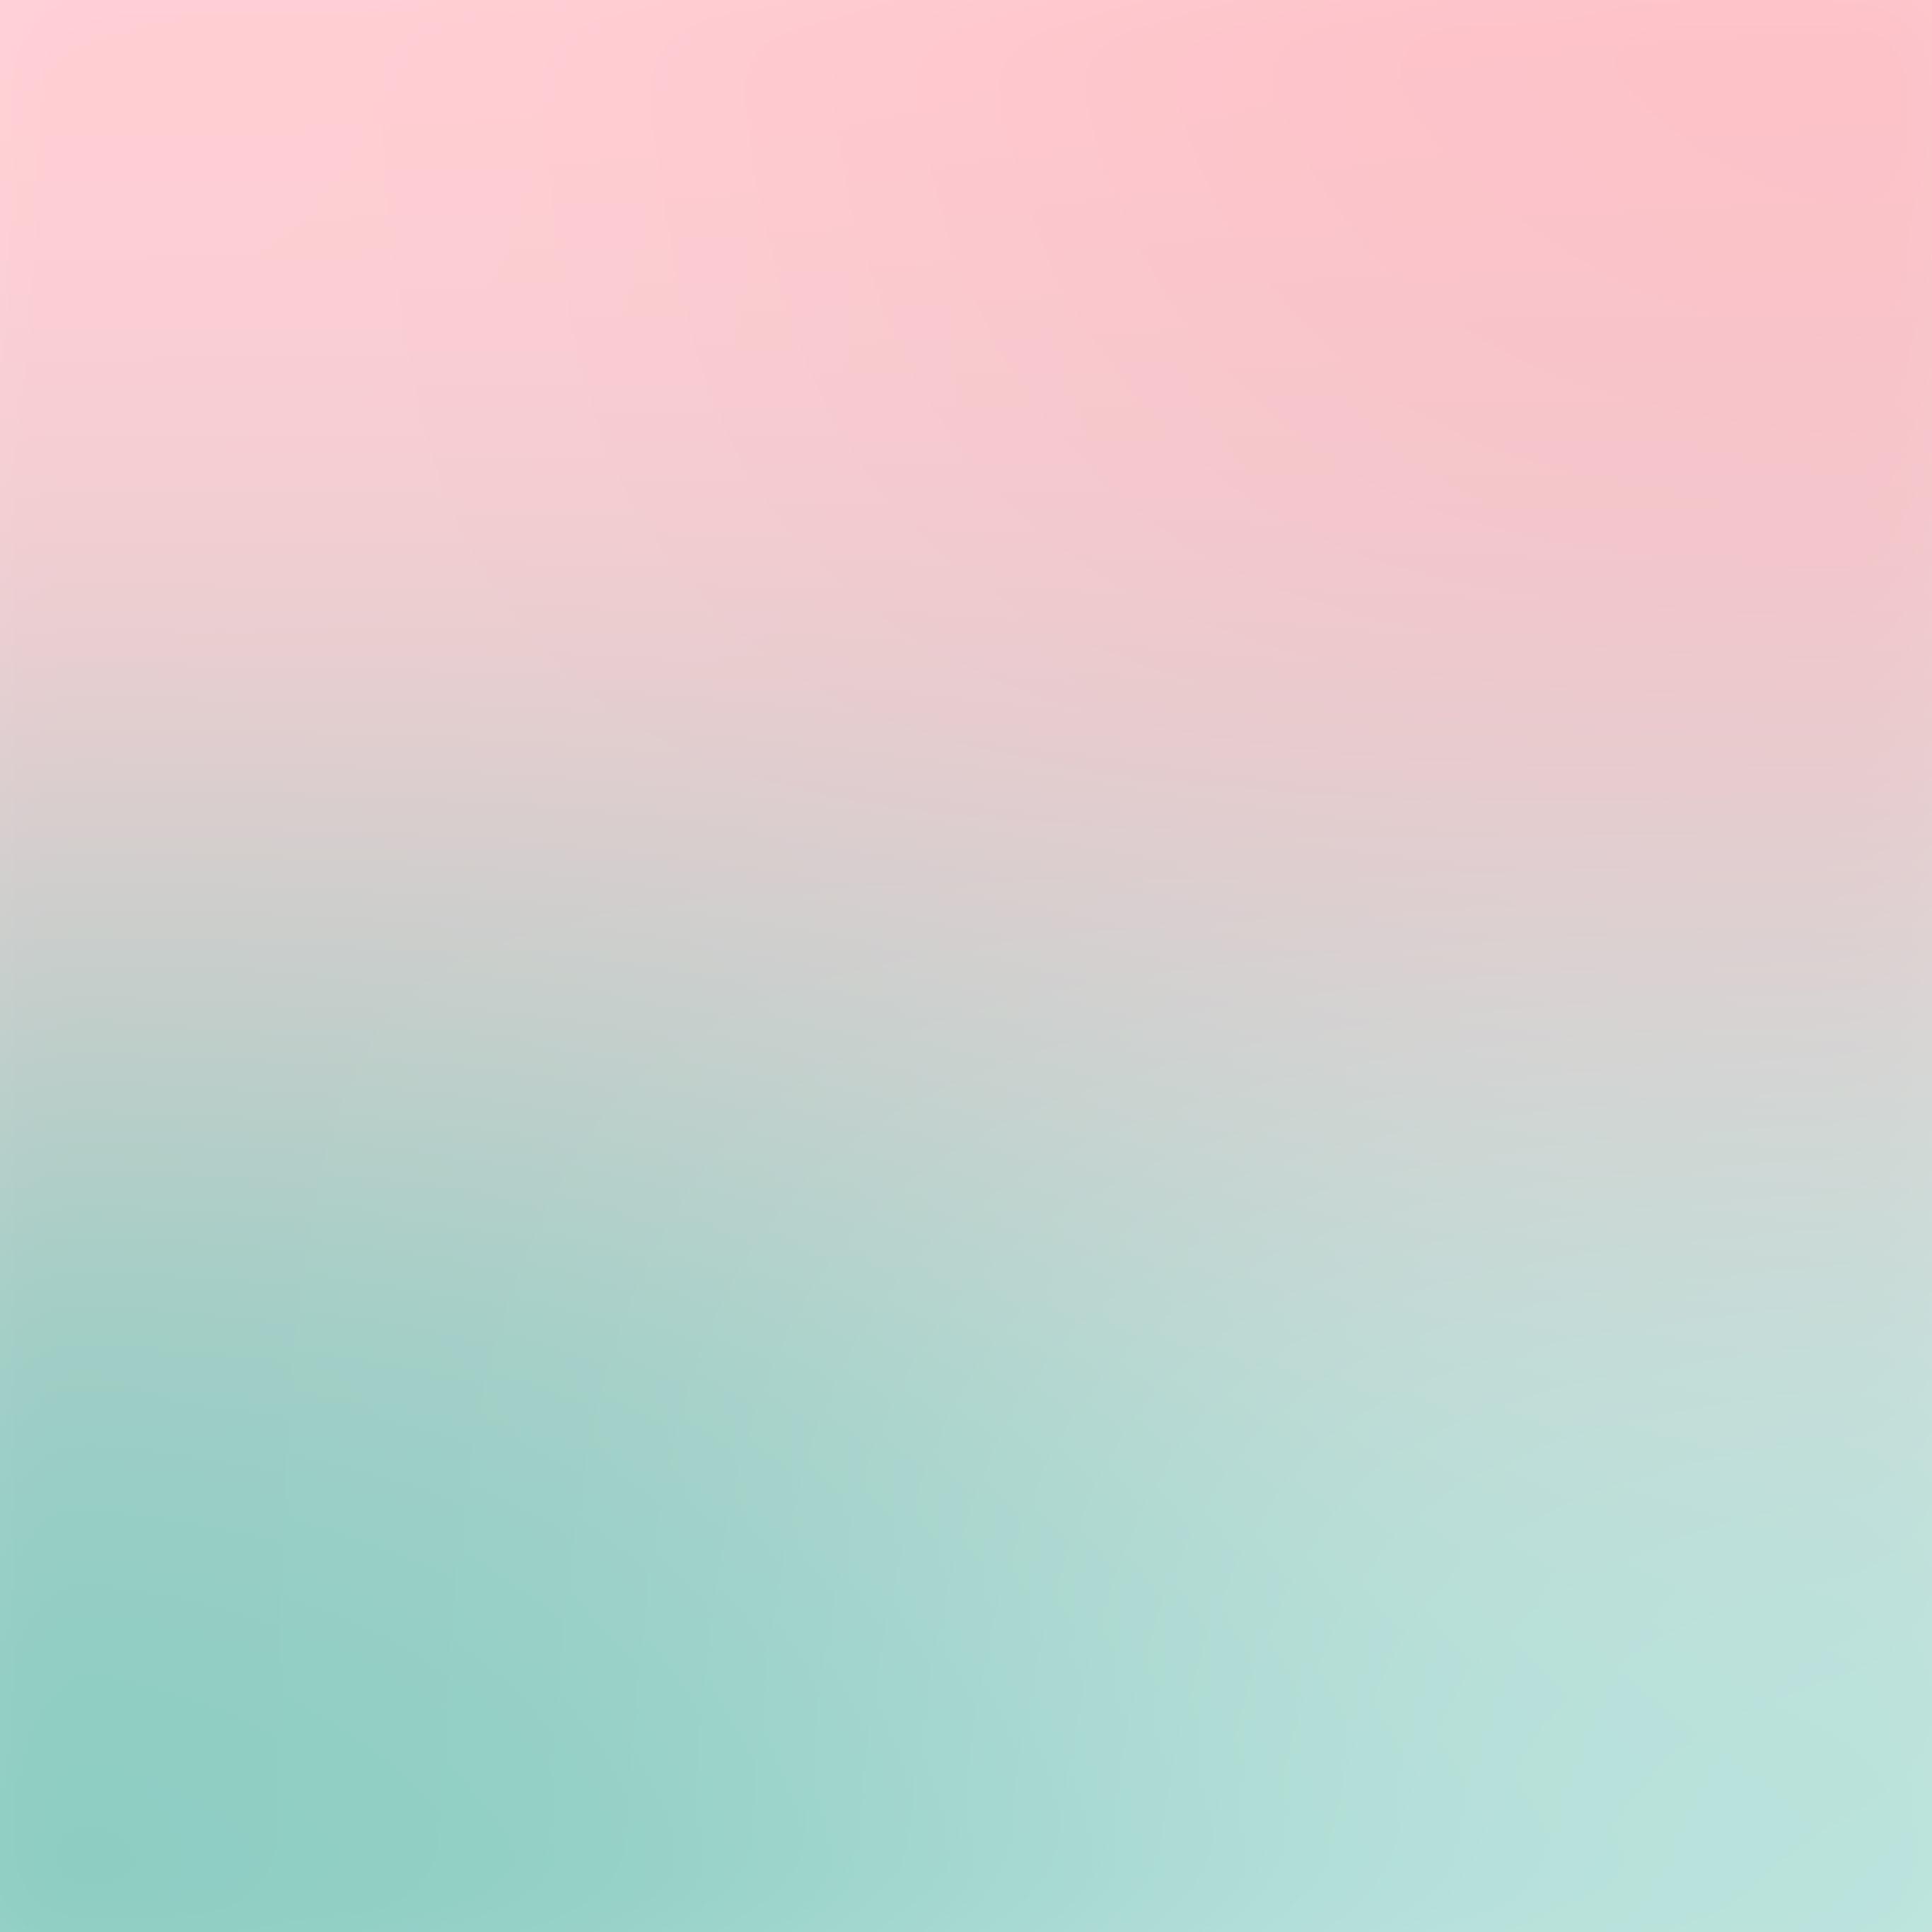 Sn08-pink-pastel-blur-gradation